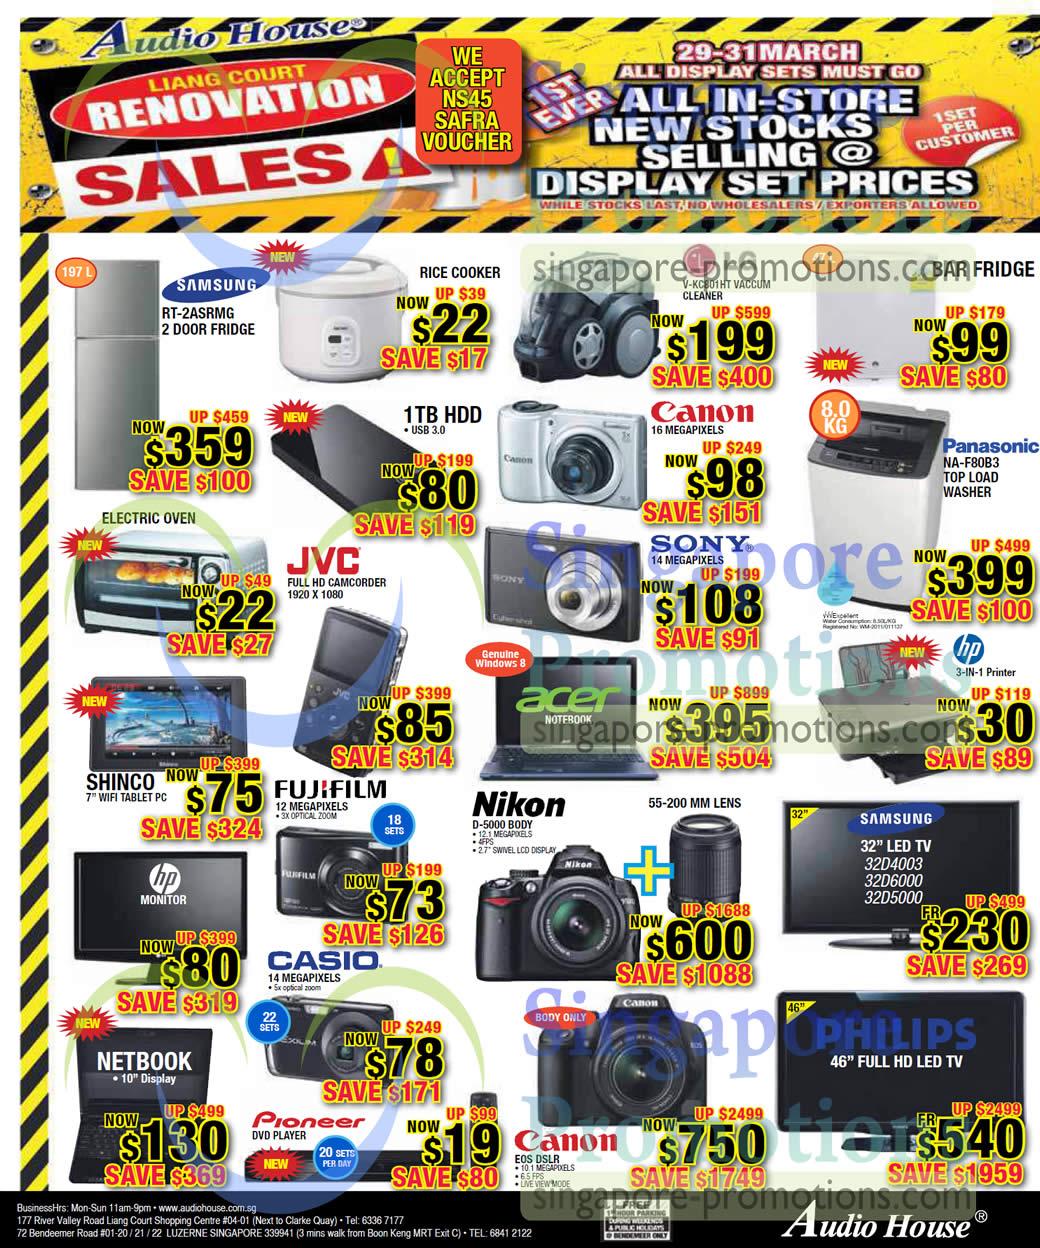 Samsung RT-2ASRMG Fridge, Nikon D5000 DSLR Digital Camera, LG V-KC801HT Vacuum Cleaner, Panasonic NA-F80B3 Washer